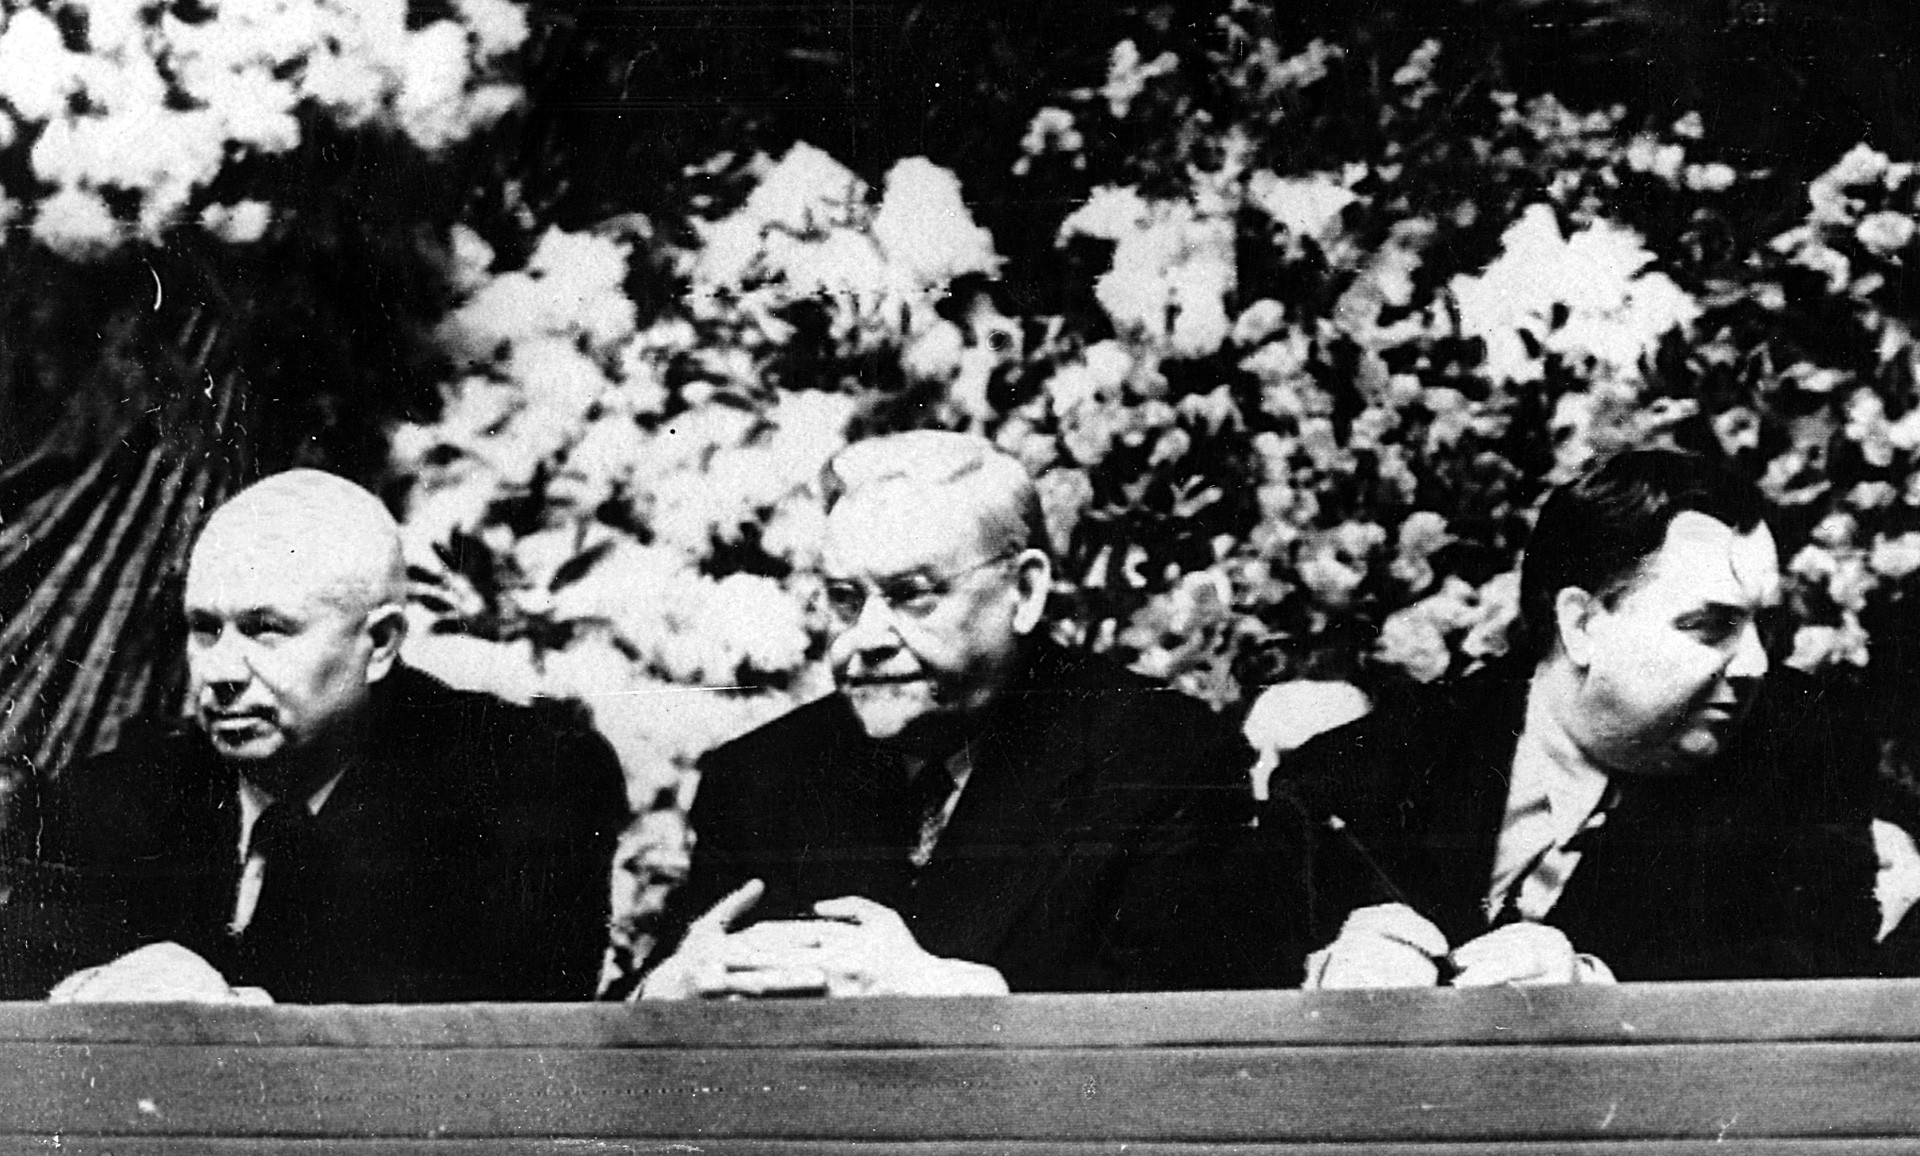 Los políticos soviéticos: Nikita Jruschov, Nikolái Bulganin y Gueorgui Malenkov.